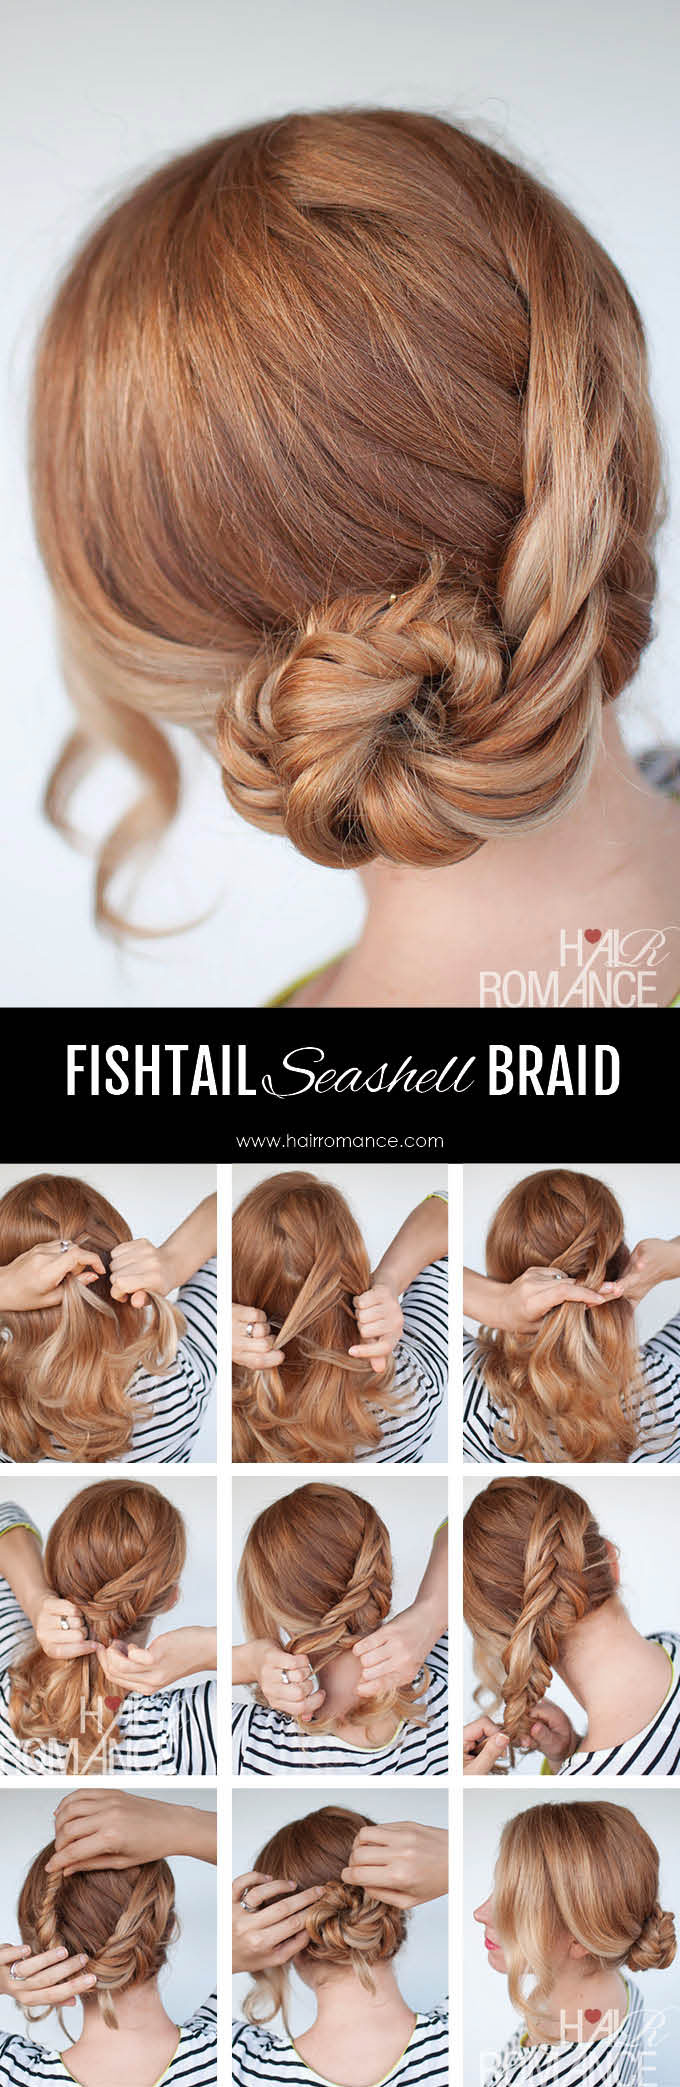 French Fishtail Seashell Braid Instructions